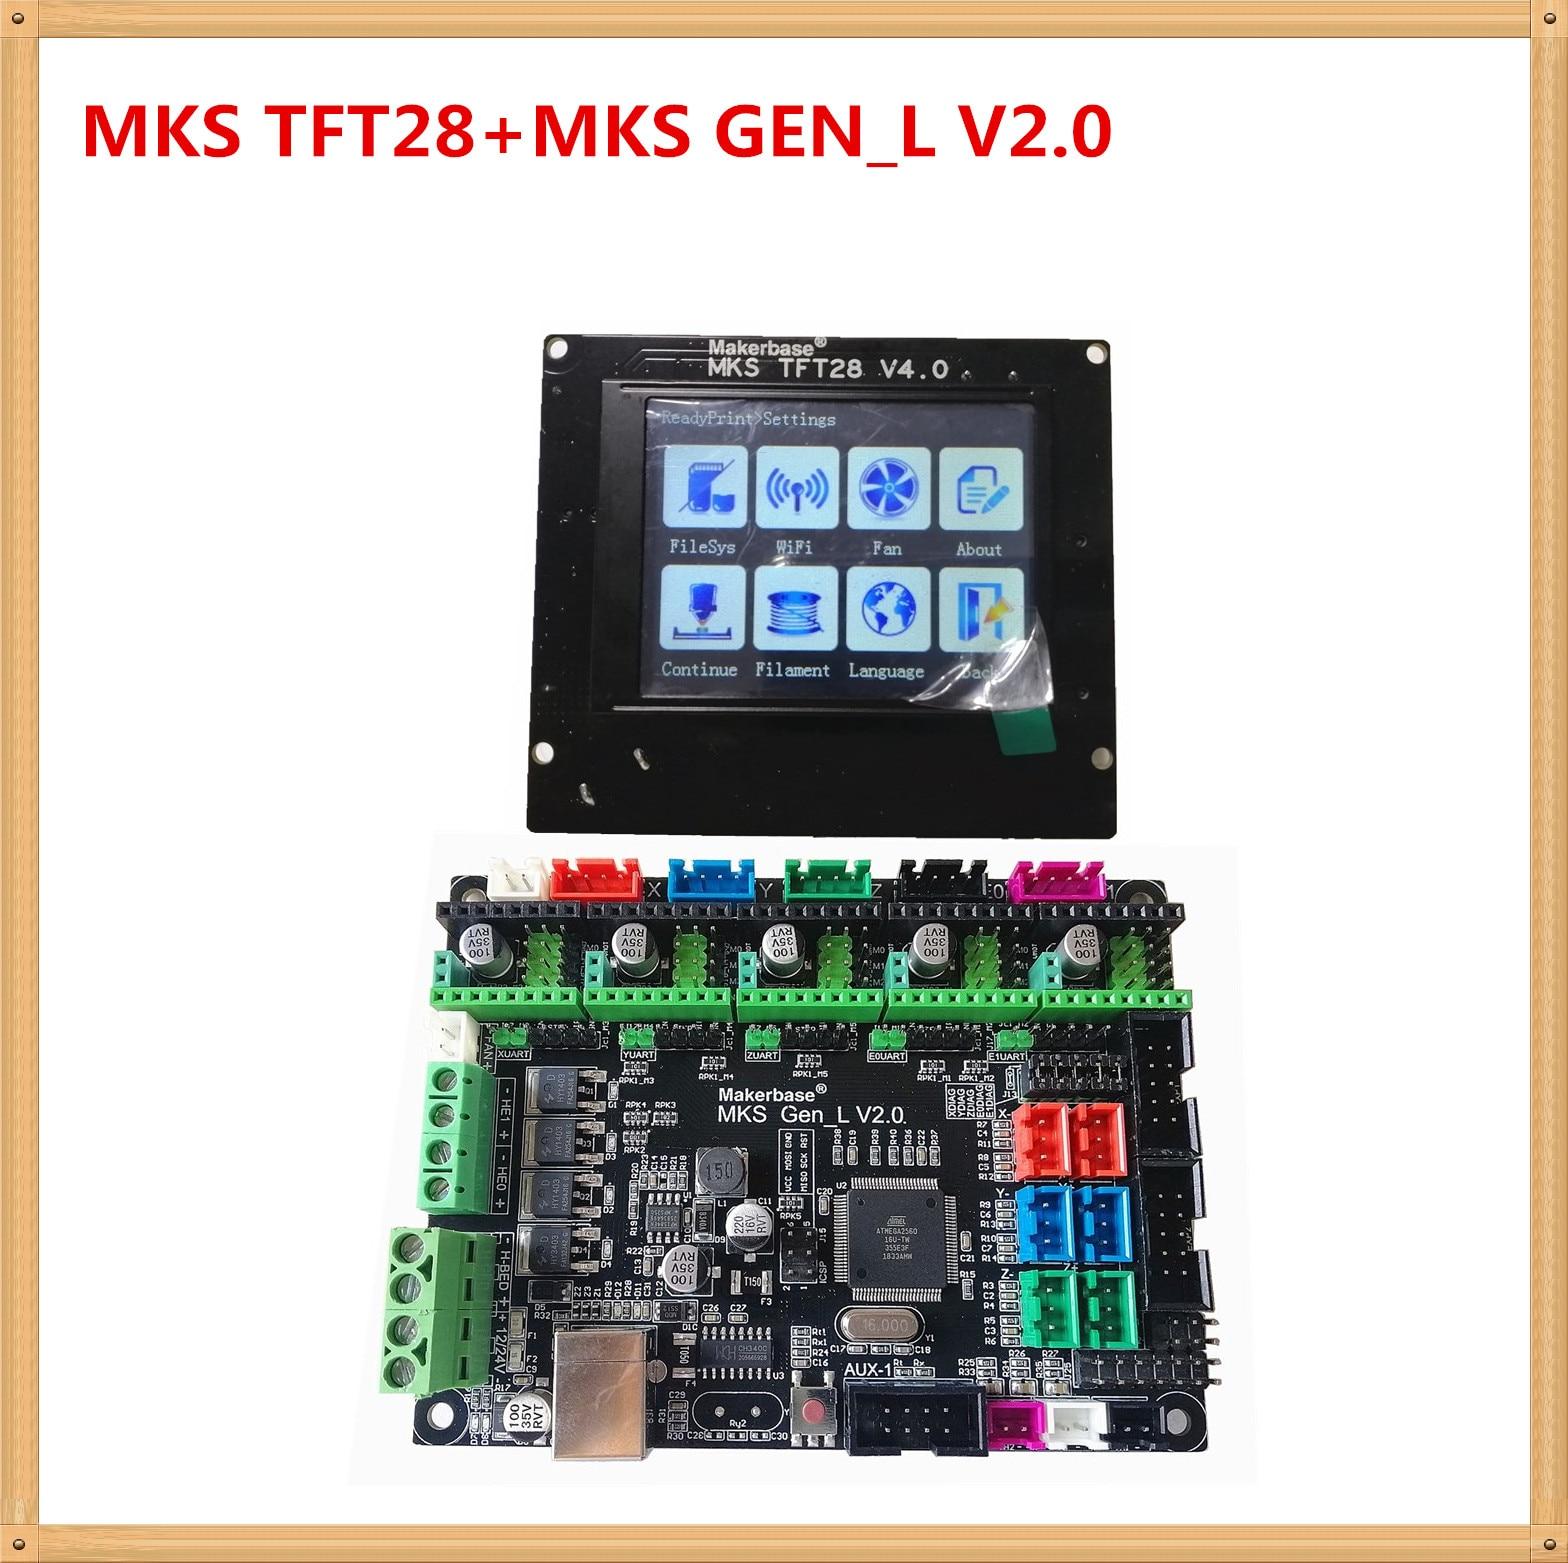 MKS GEN L V2.0 + MKS TFT28 pantalla en color minipanel pantalla táctil barato 3D impresión kits escolares controlador 3d impresora starter unidad - 2